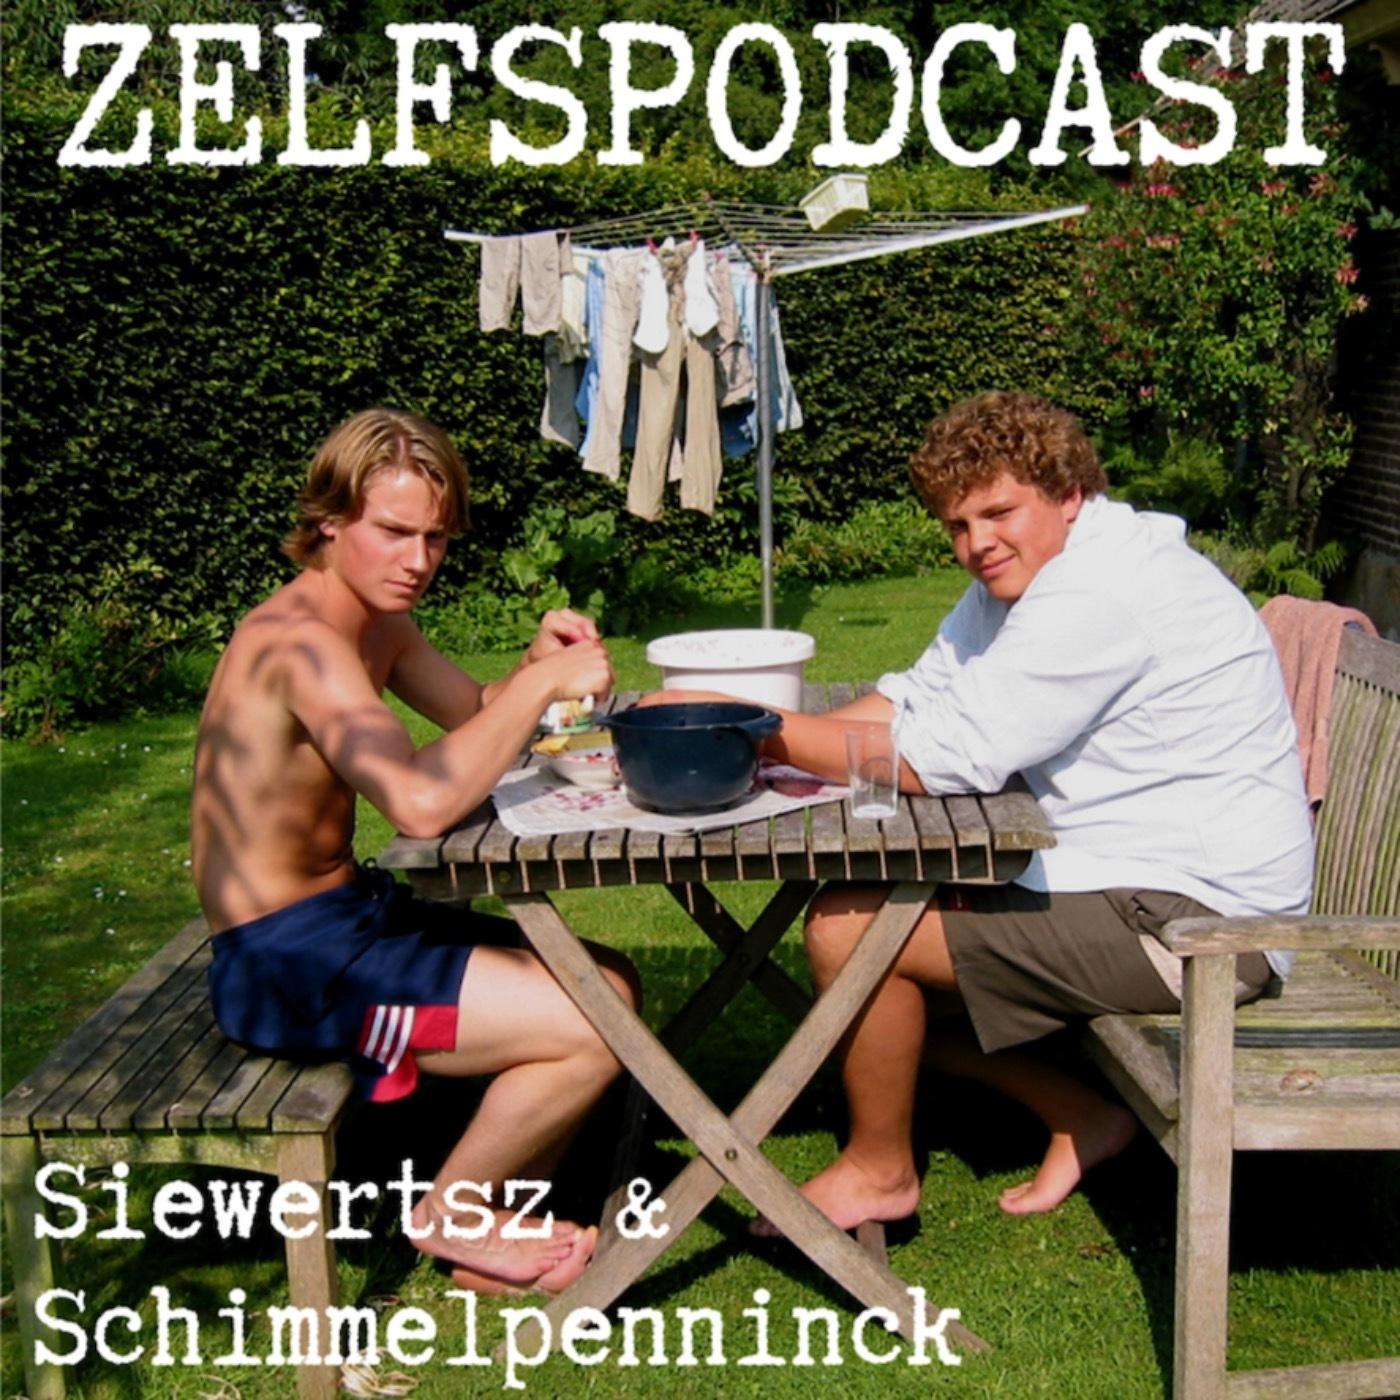 S2E24 - Mediamoe(ite)